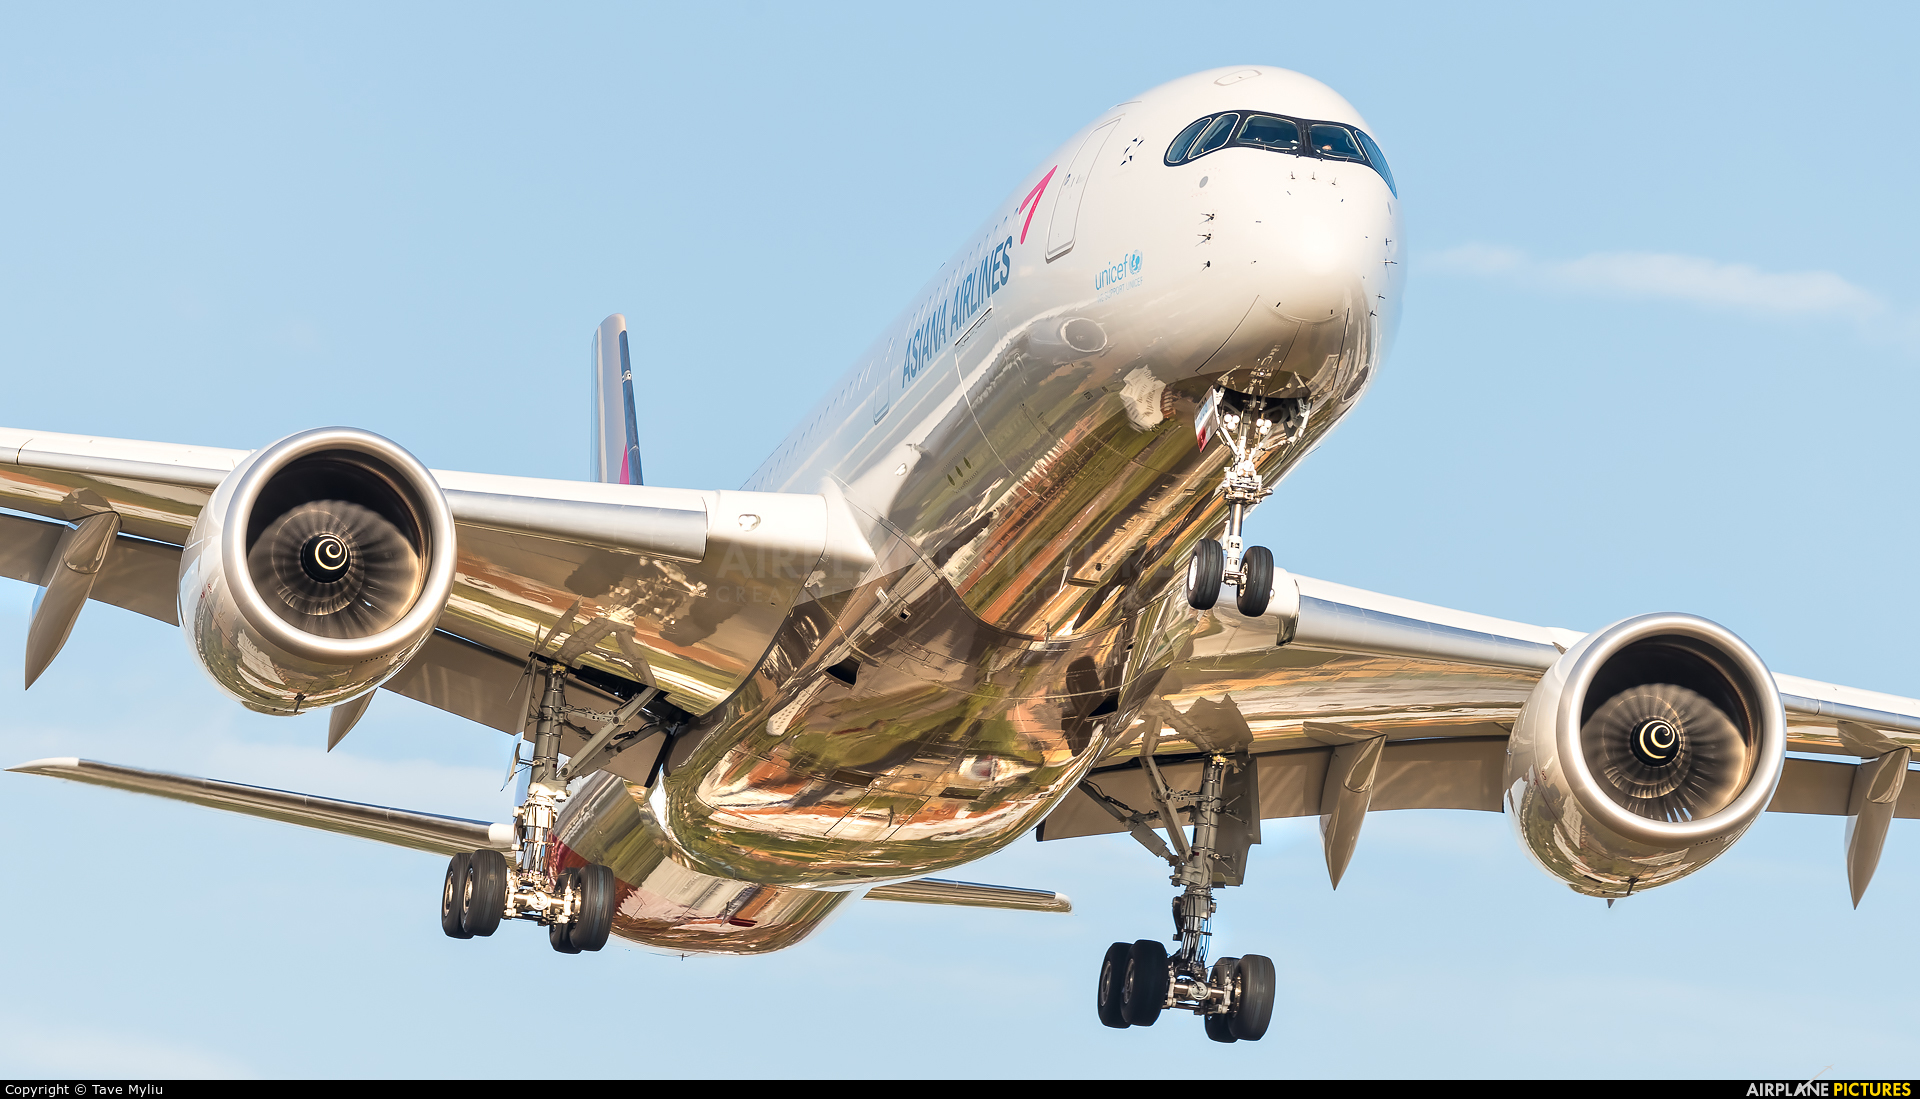 Asiana Airlines HL8308 aircraft at London - Heathrow